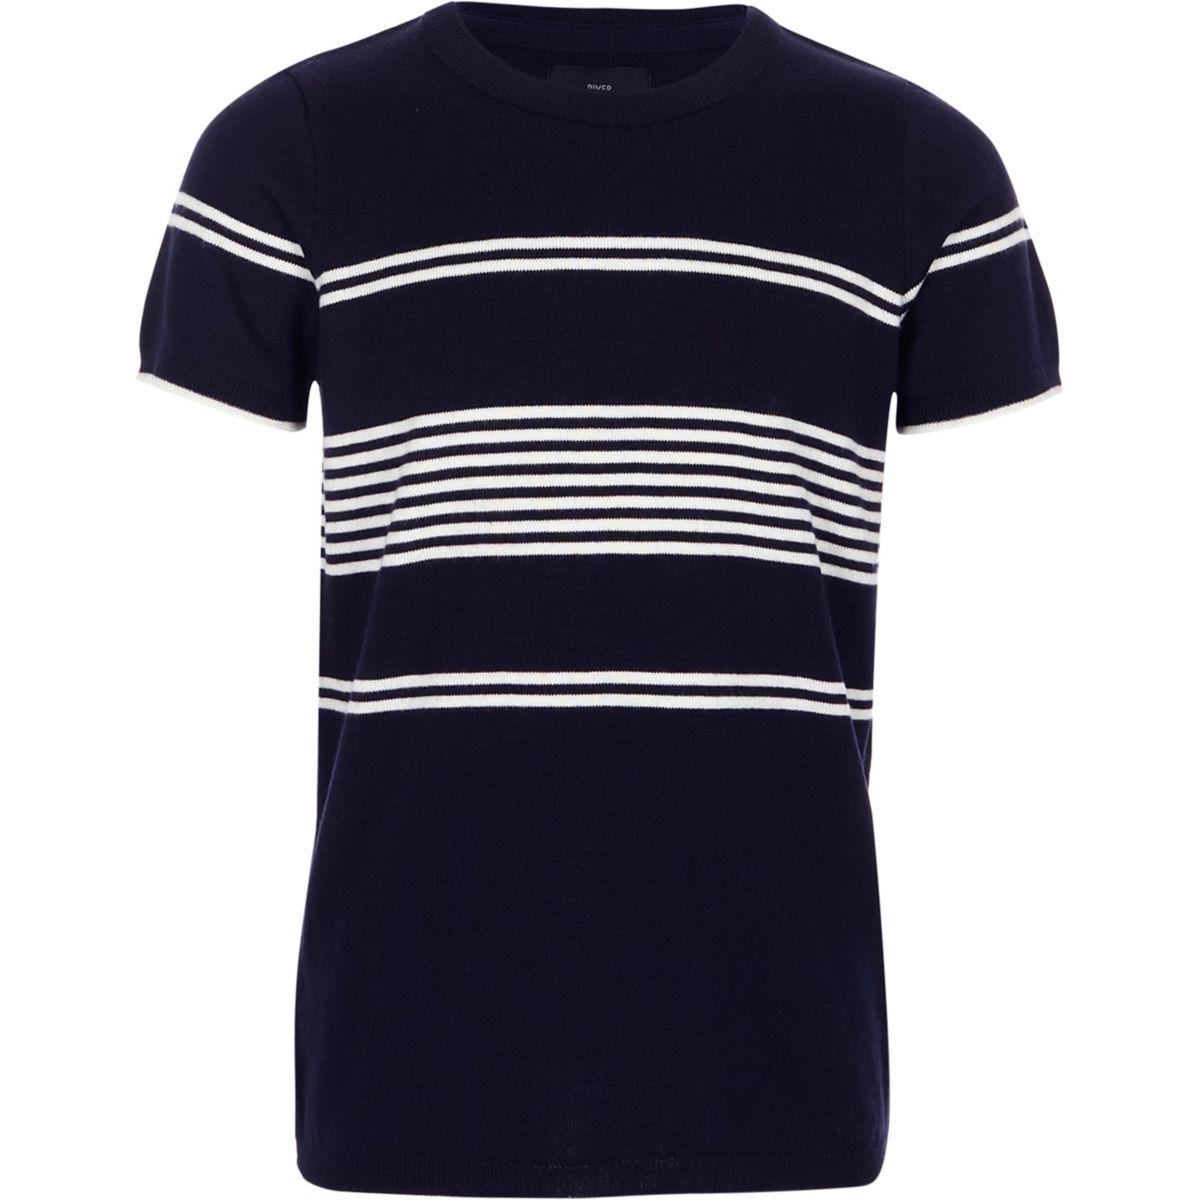 T-shirt en maille rayé bleu marine pour garçon